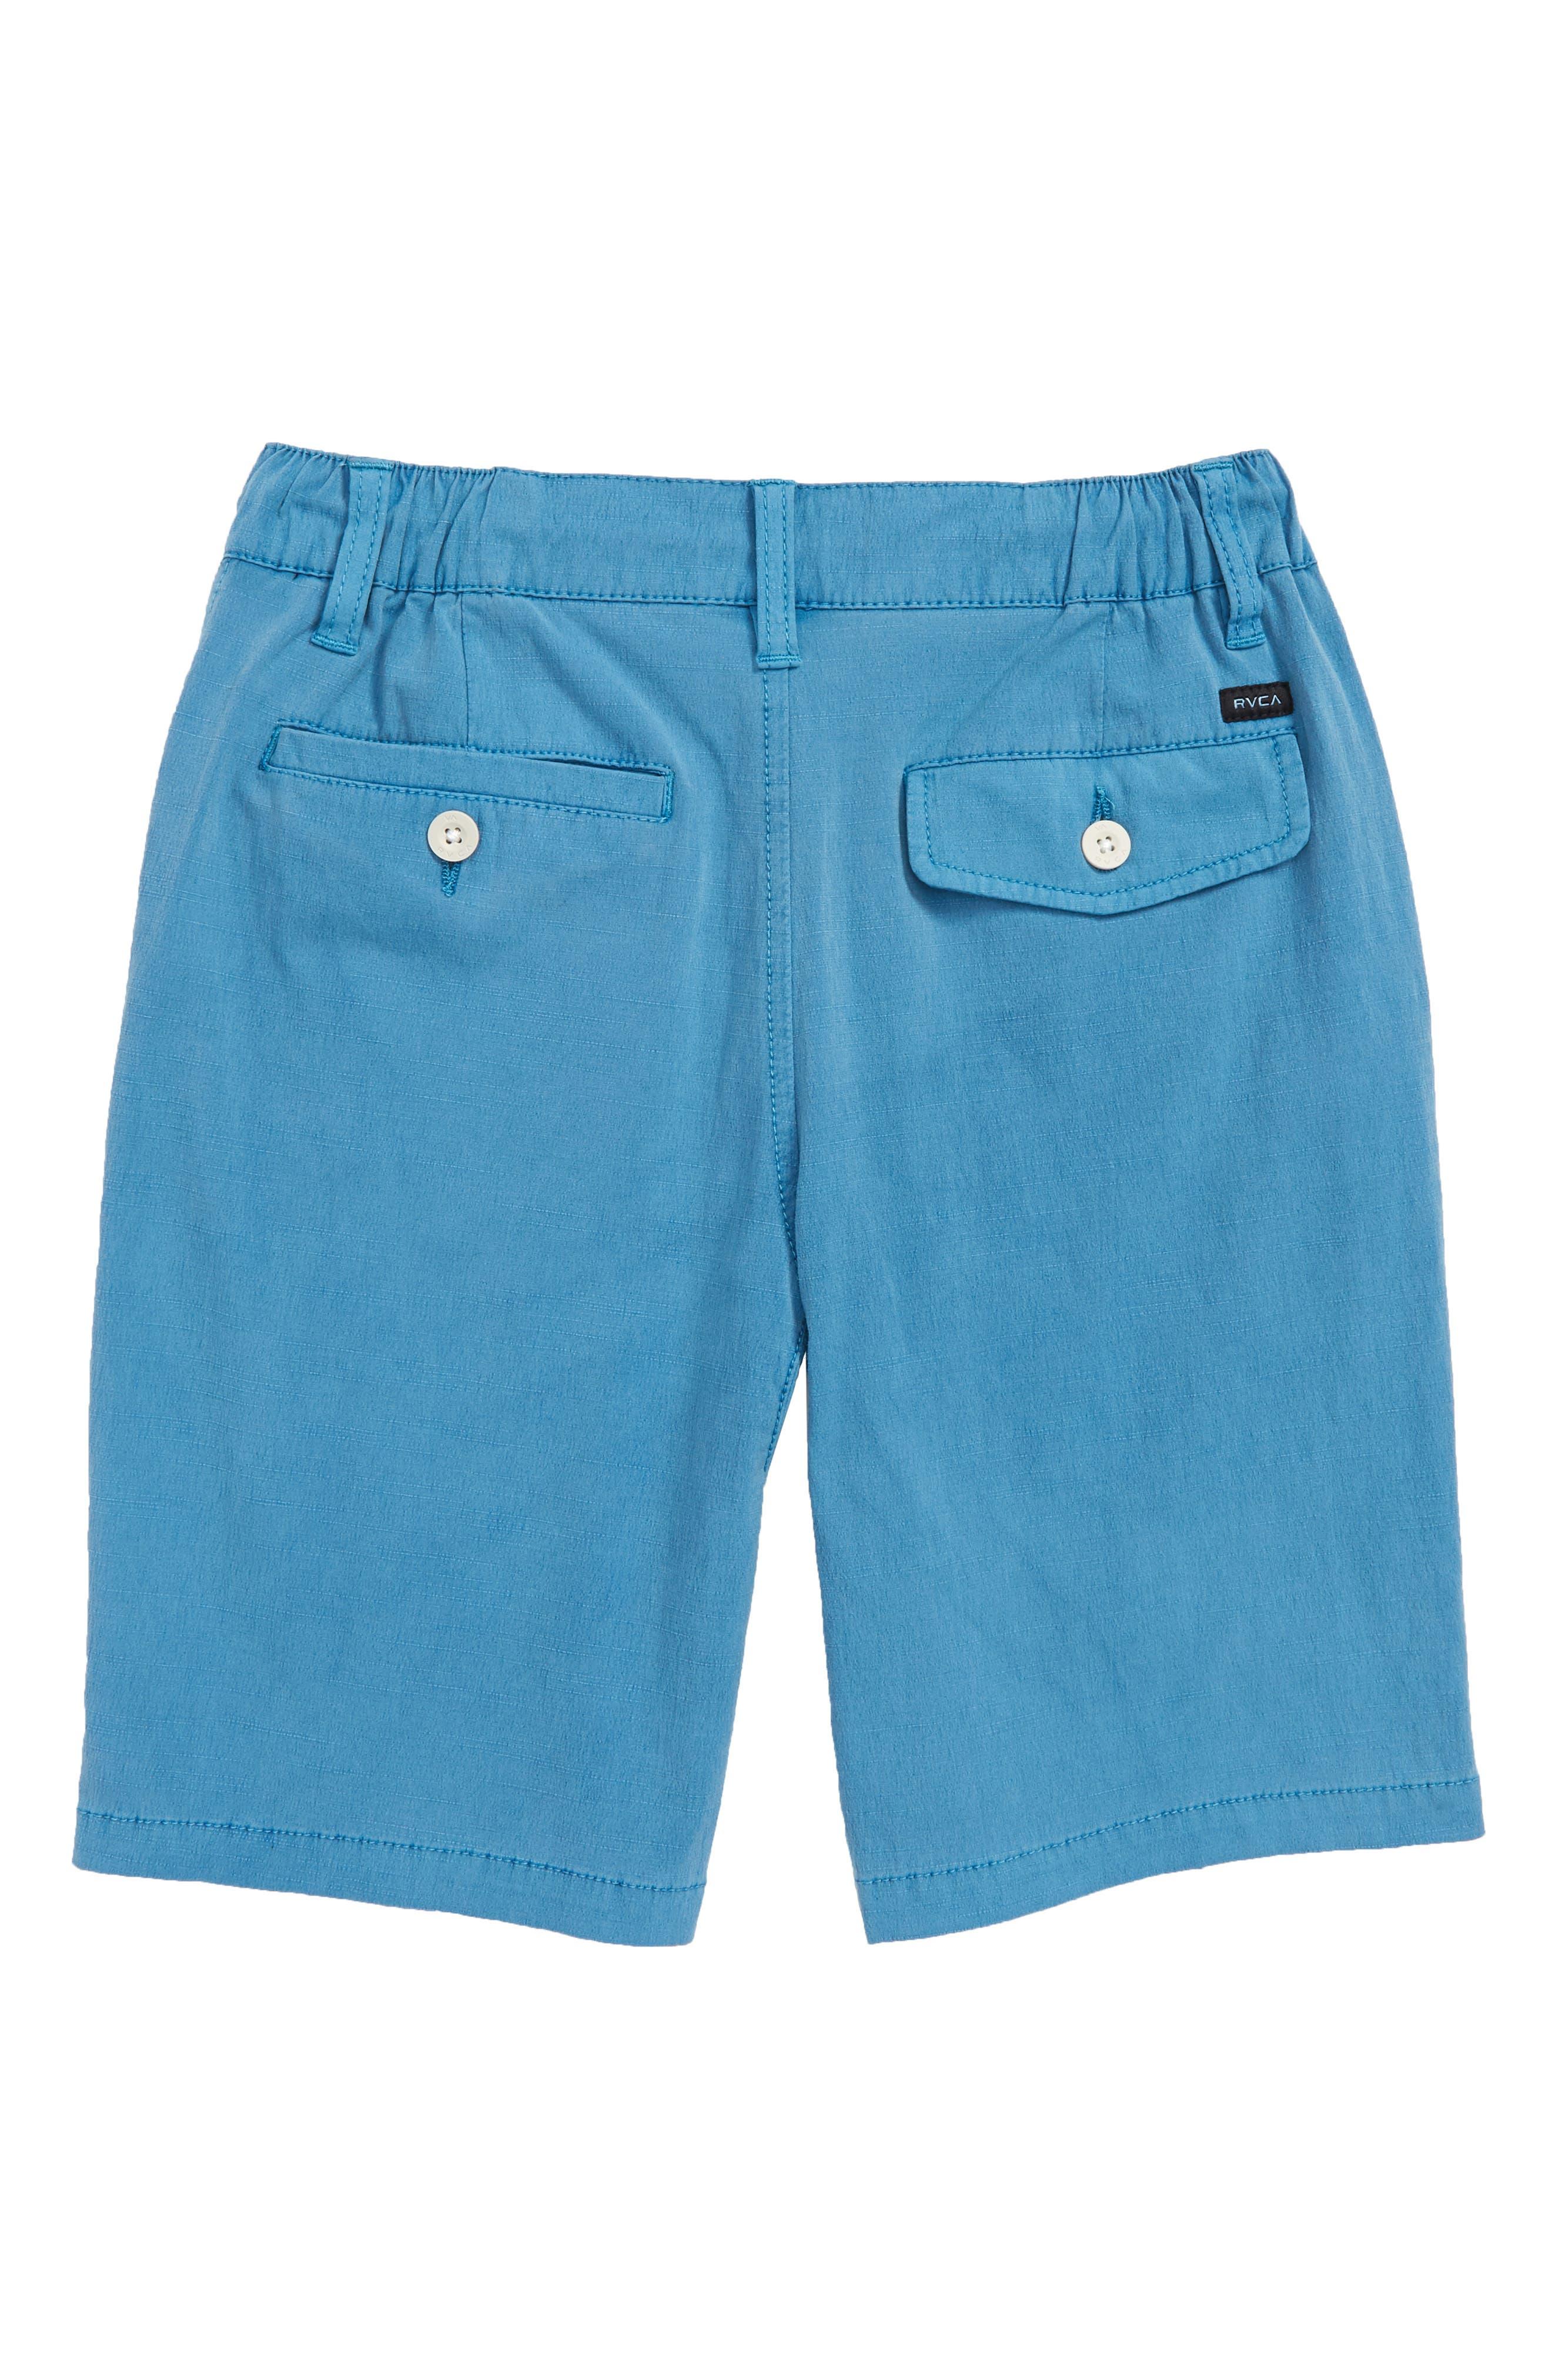 All Time Coastal SOL Hybrid Shorts,                             Alternate thumbnail 2, color,                             LAGOON